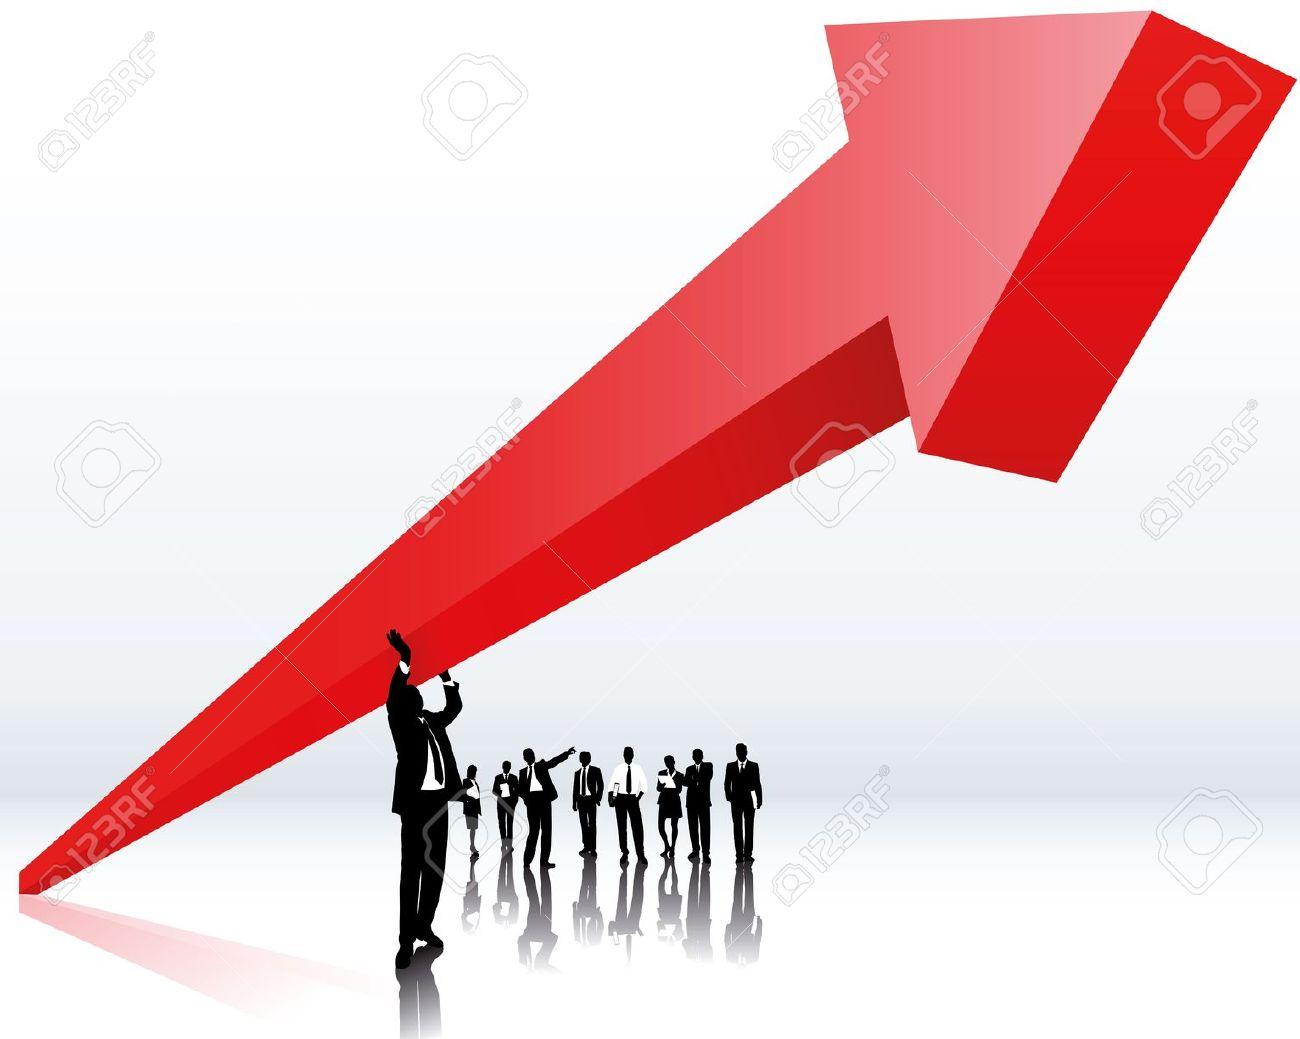 Upward trend clipart png free library Upward trend clipart - ClipartFest png free library